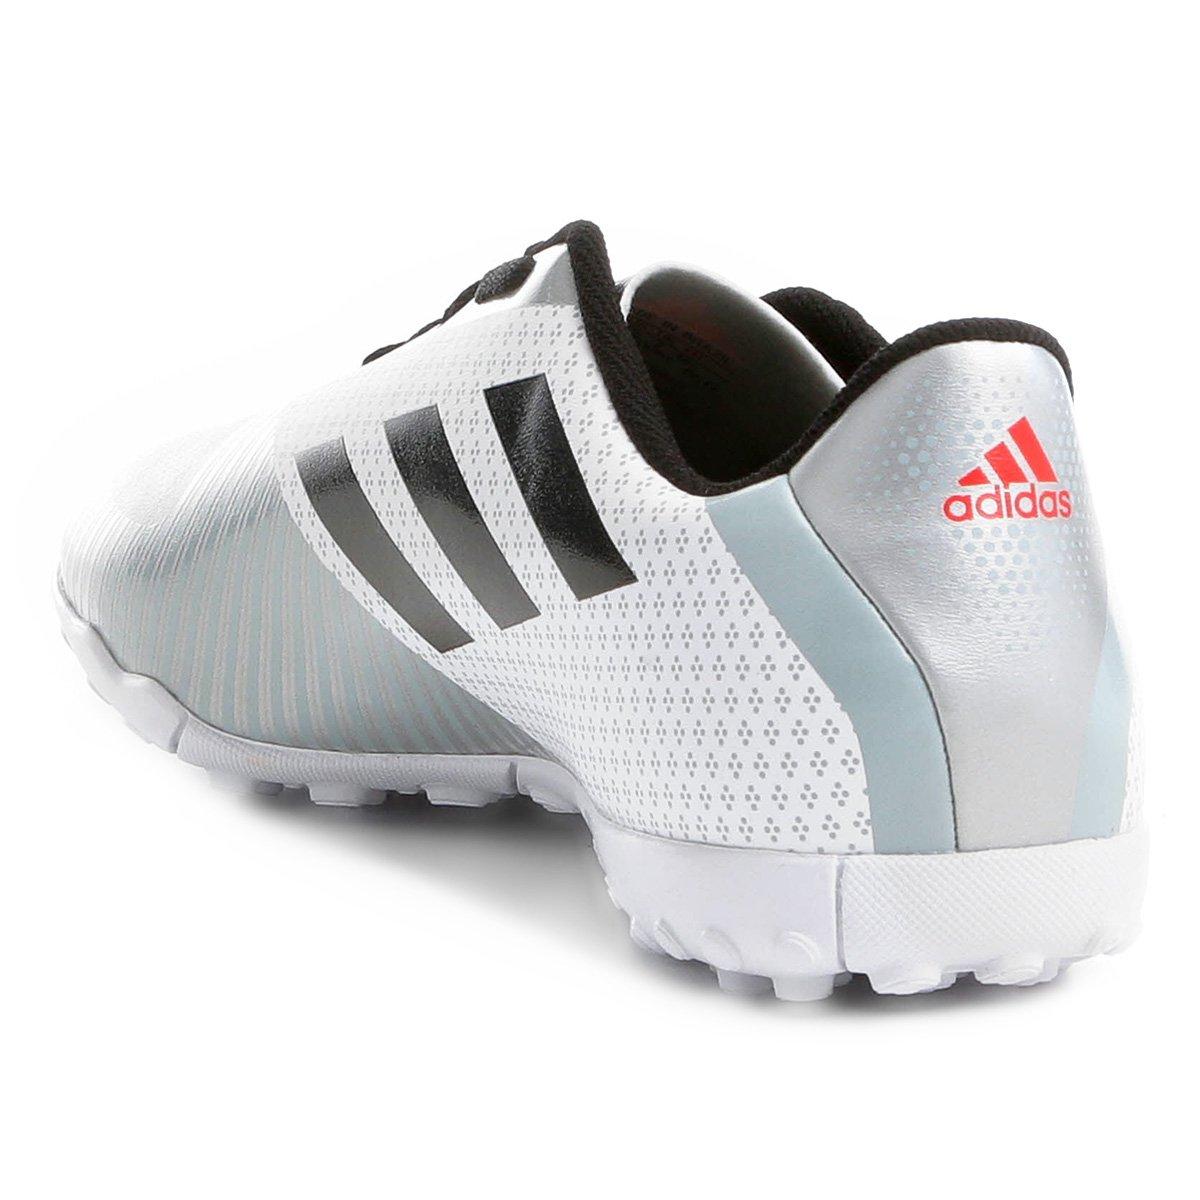 Chuteira Society Adidas Artilheira 18 TF - Branco e Preto - Compre ... cb6e473644b06